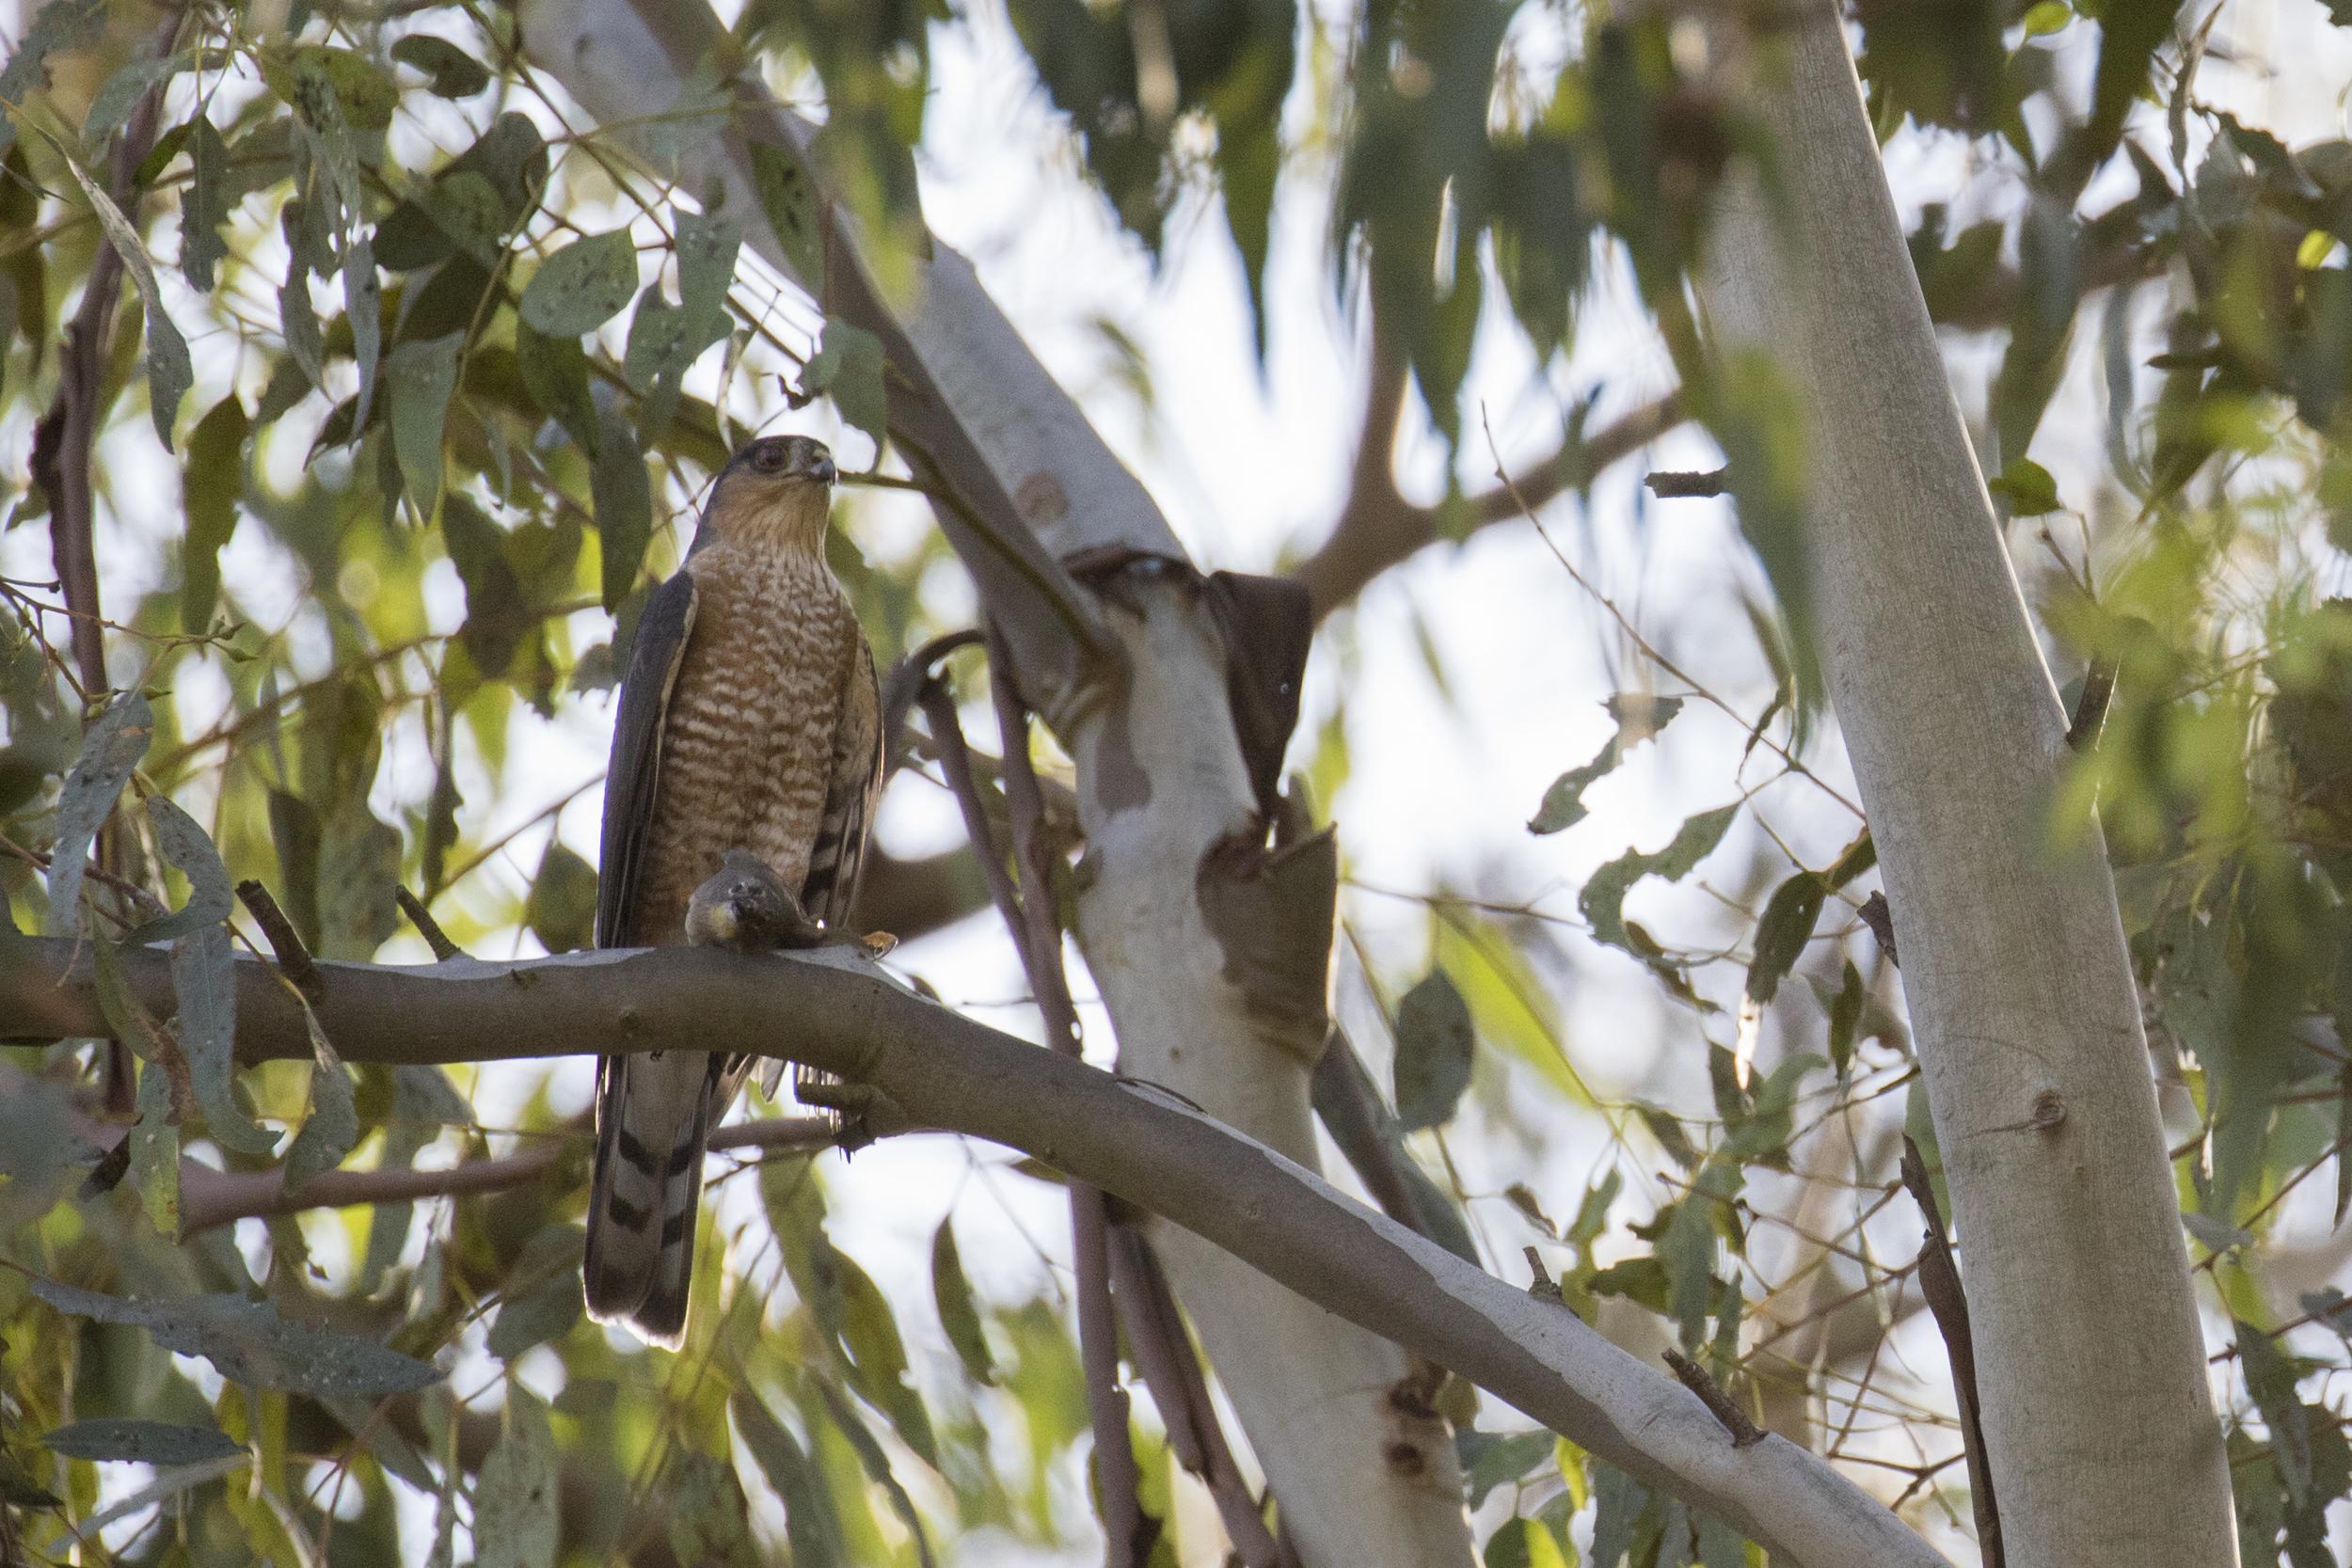 Sharp-shinned Hawk (Accipiter striatus) in Laguna Niguel, California. December 2015. Not baited. Not called in.